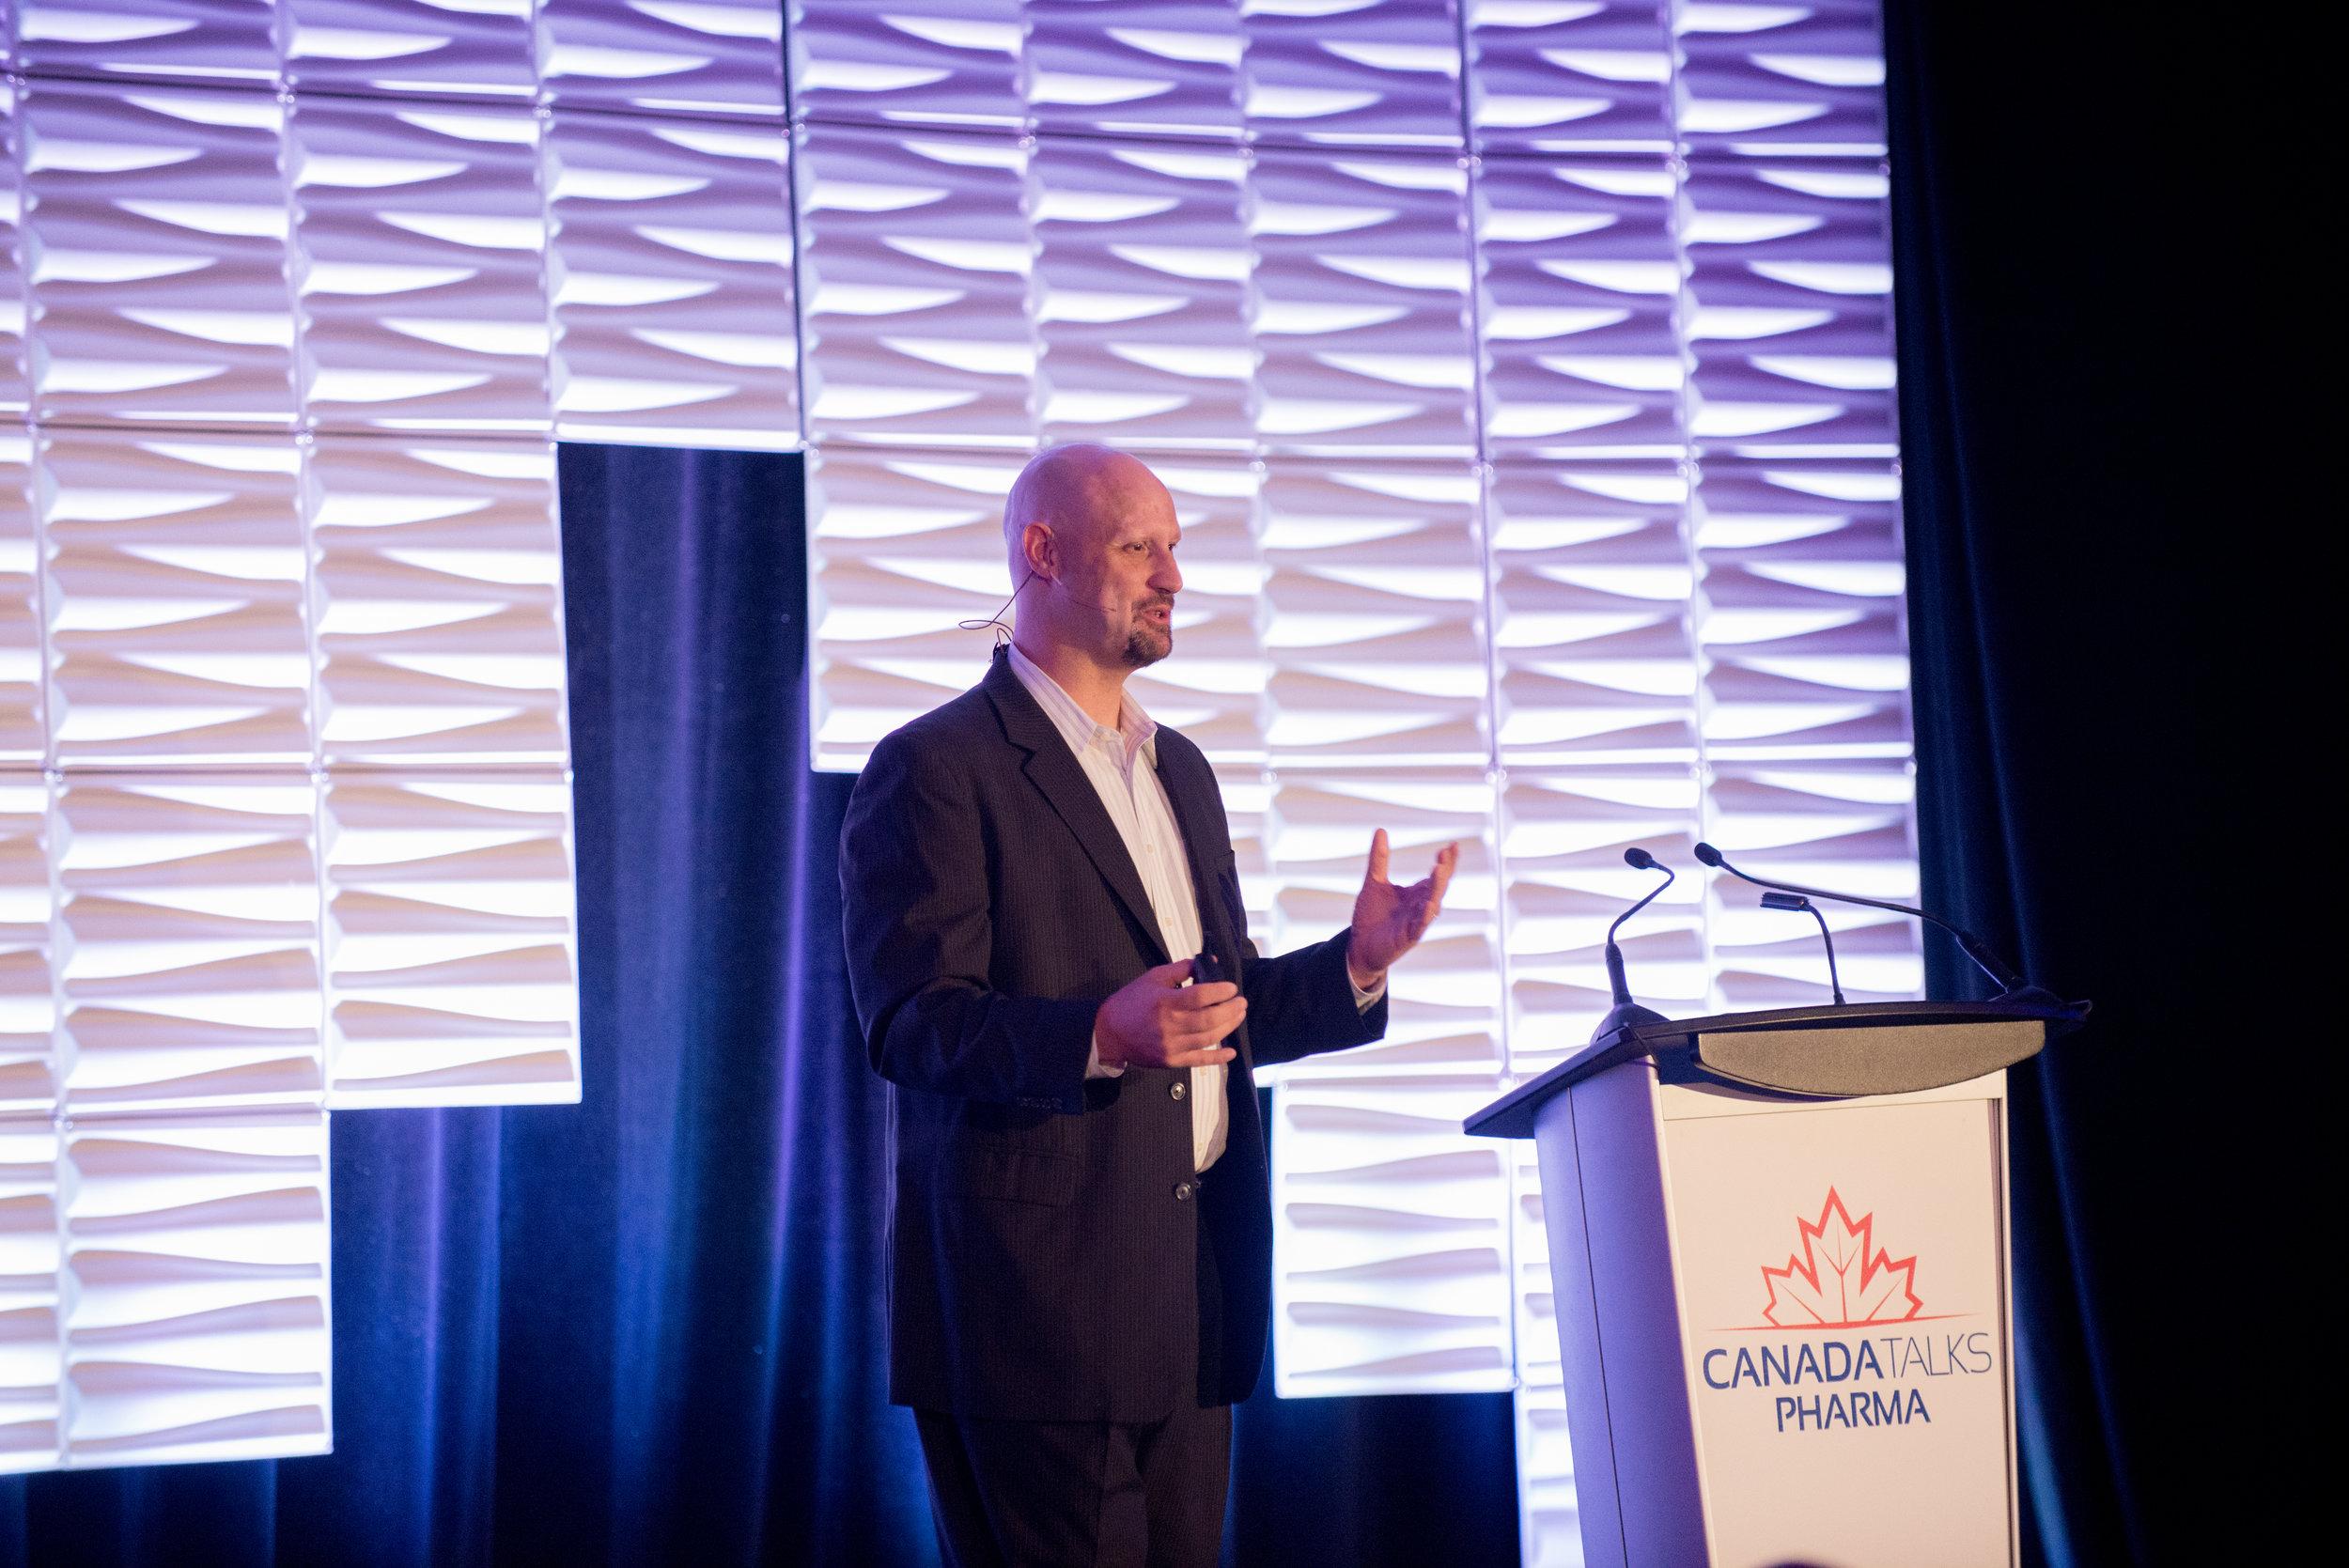 Canada Talks Pharma